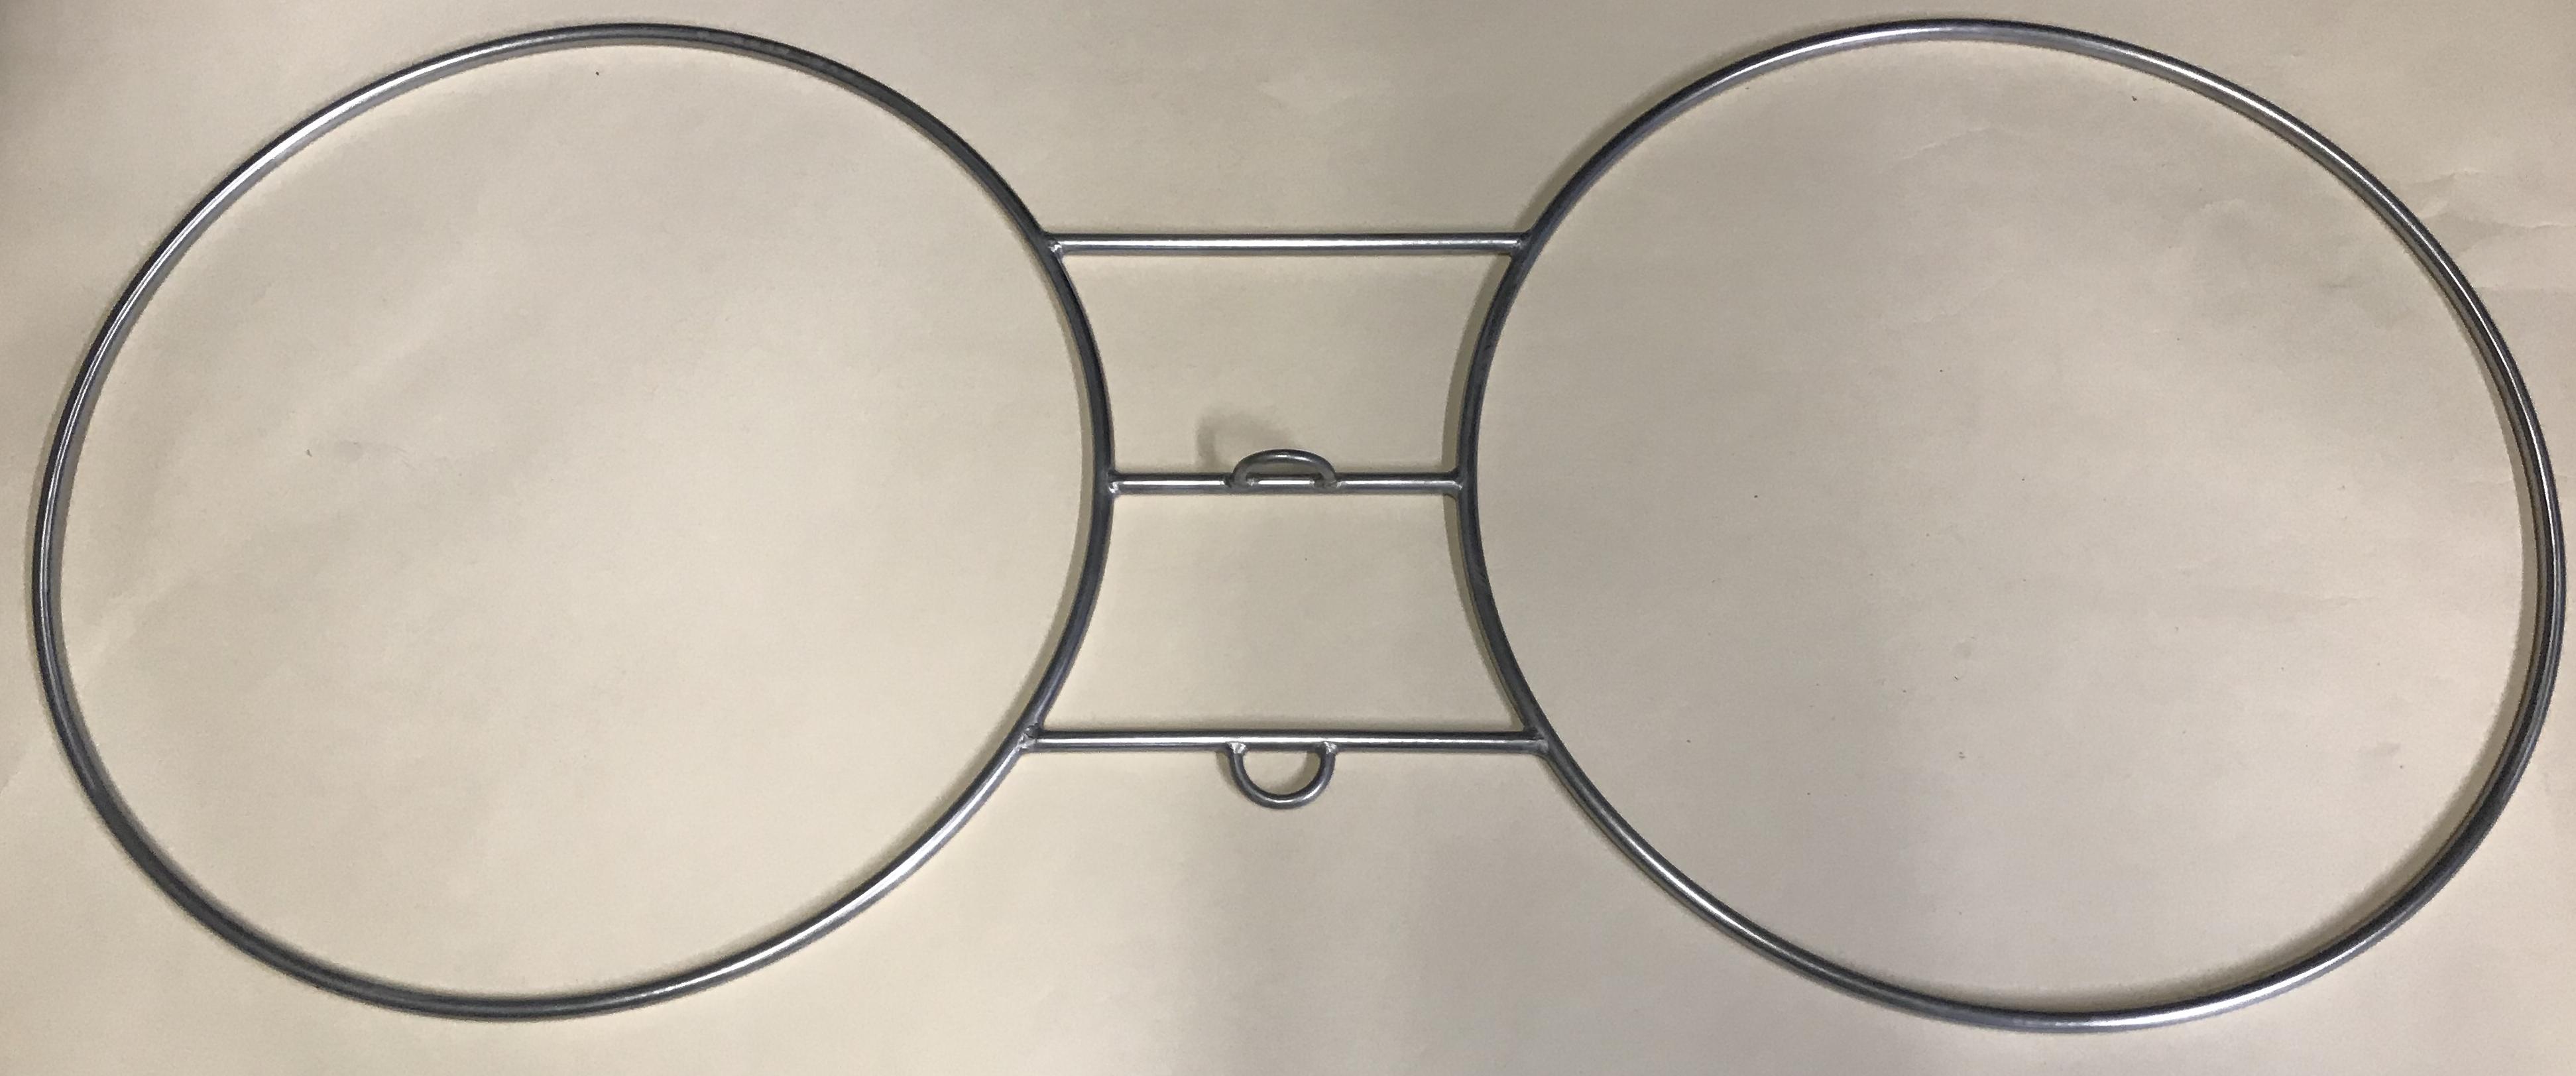 Bongo Rings, 60cm Stainless Steel